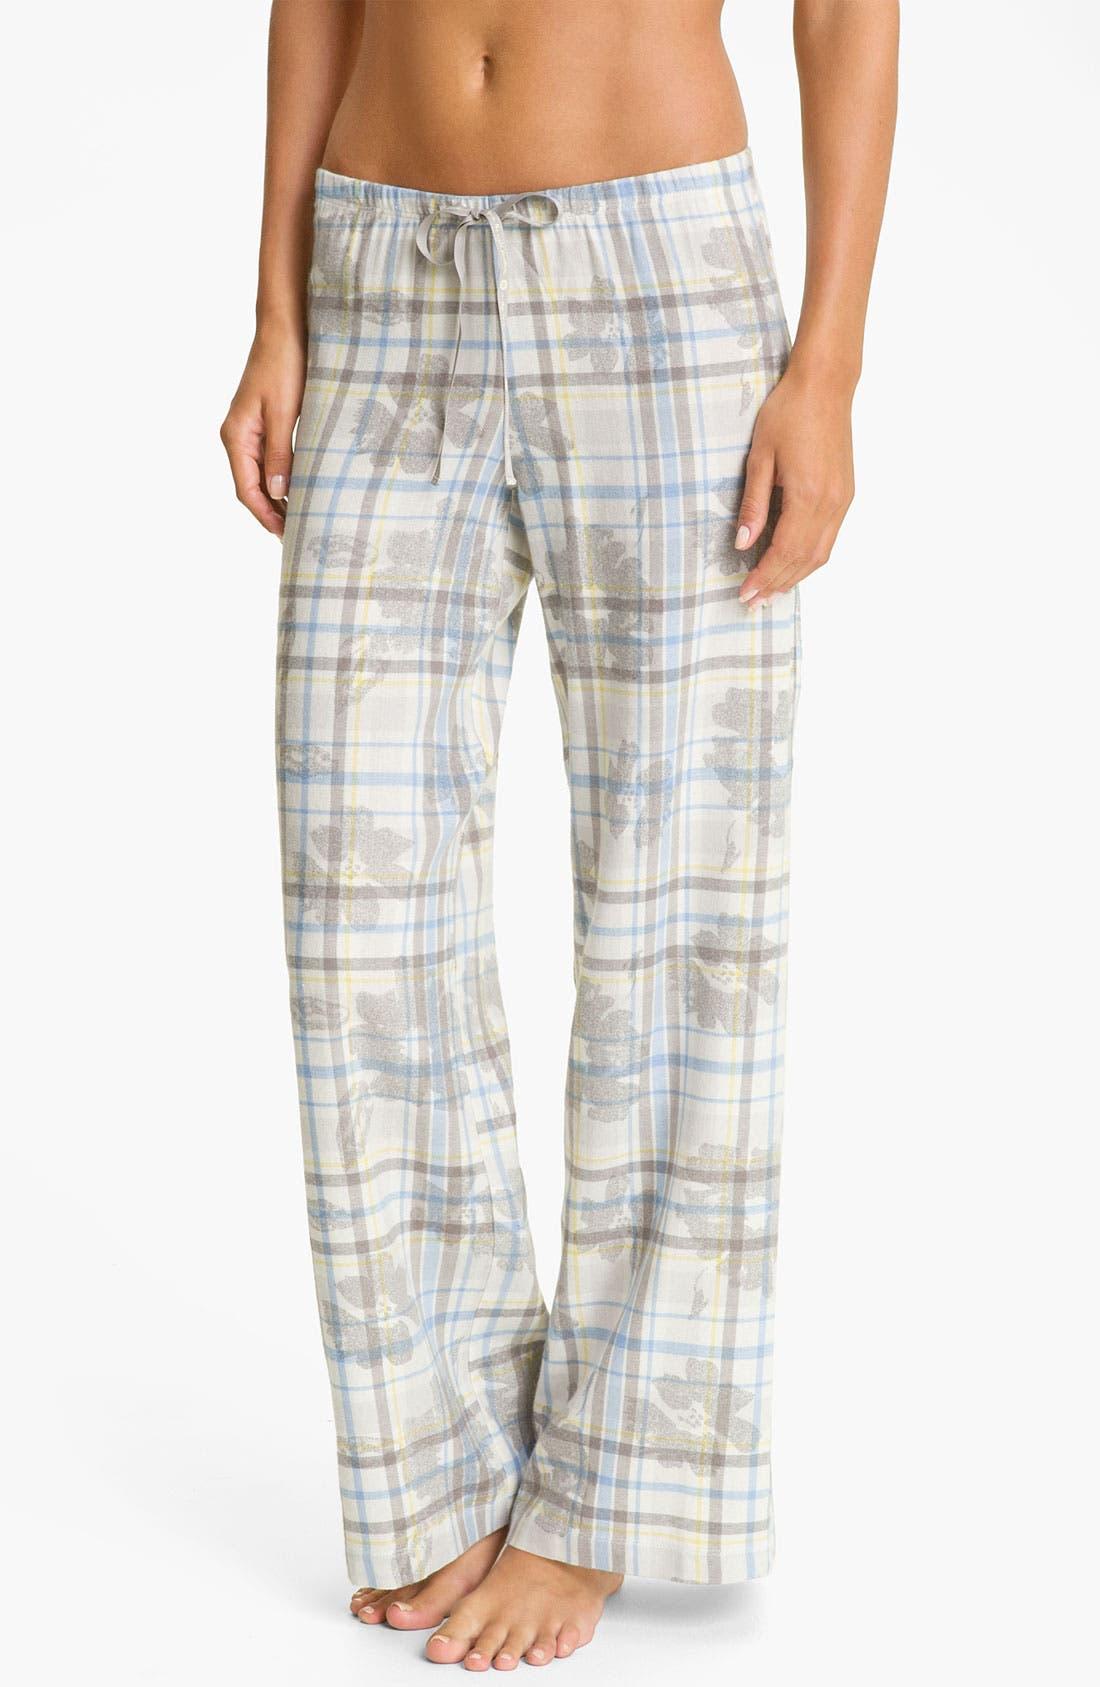 Alternate Image 1 Selected - Hue 'Cassie Floral' Pajama Pants